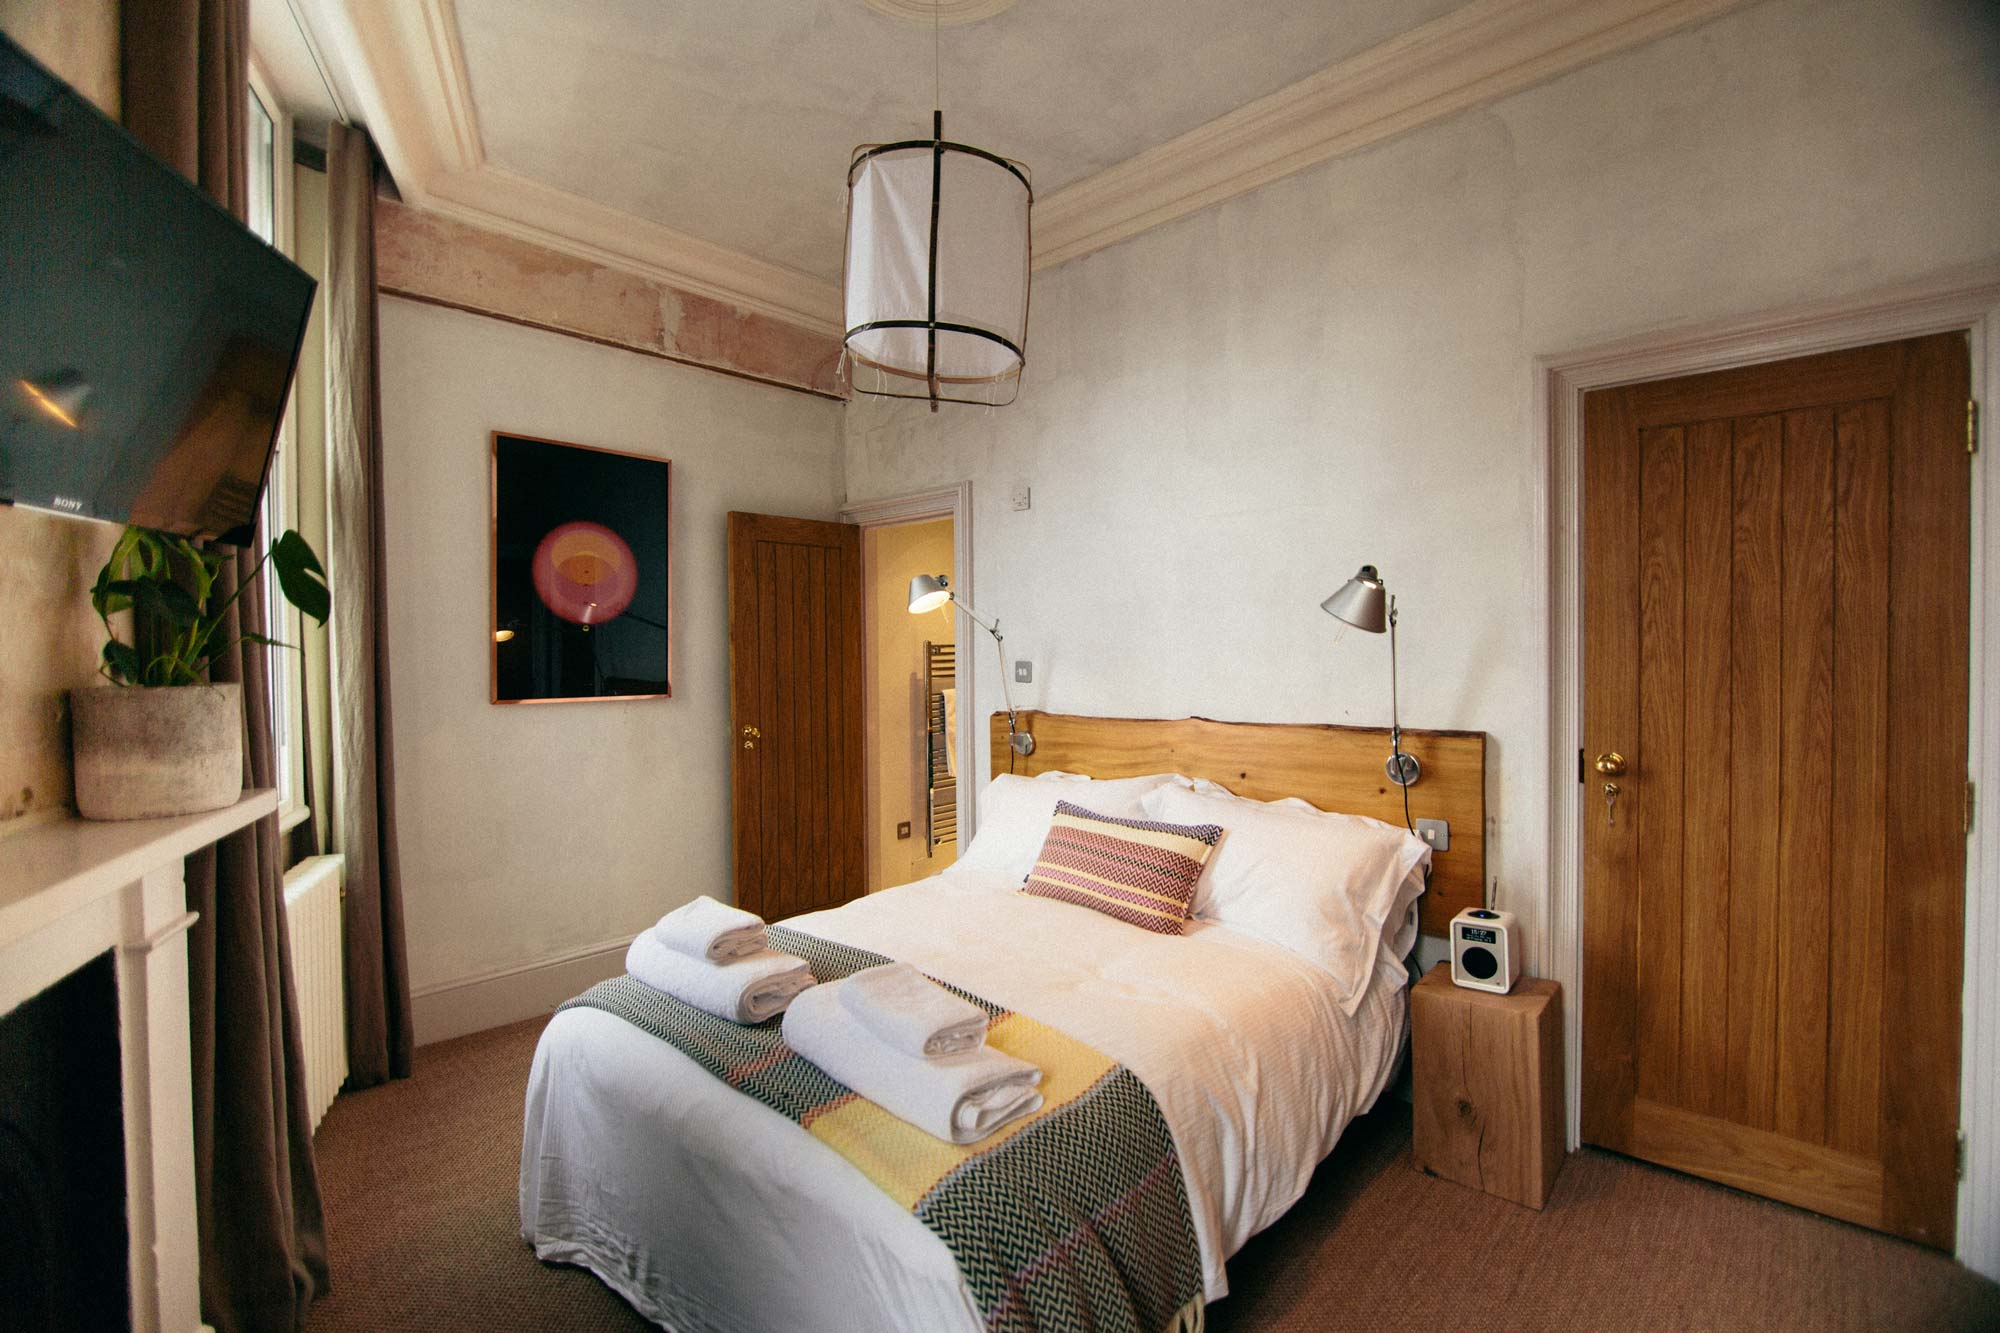 Bedrooms The Culpeper